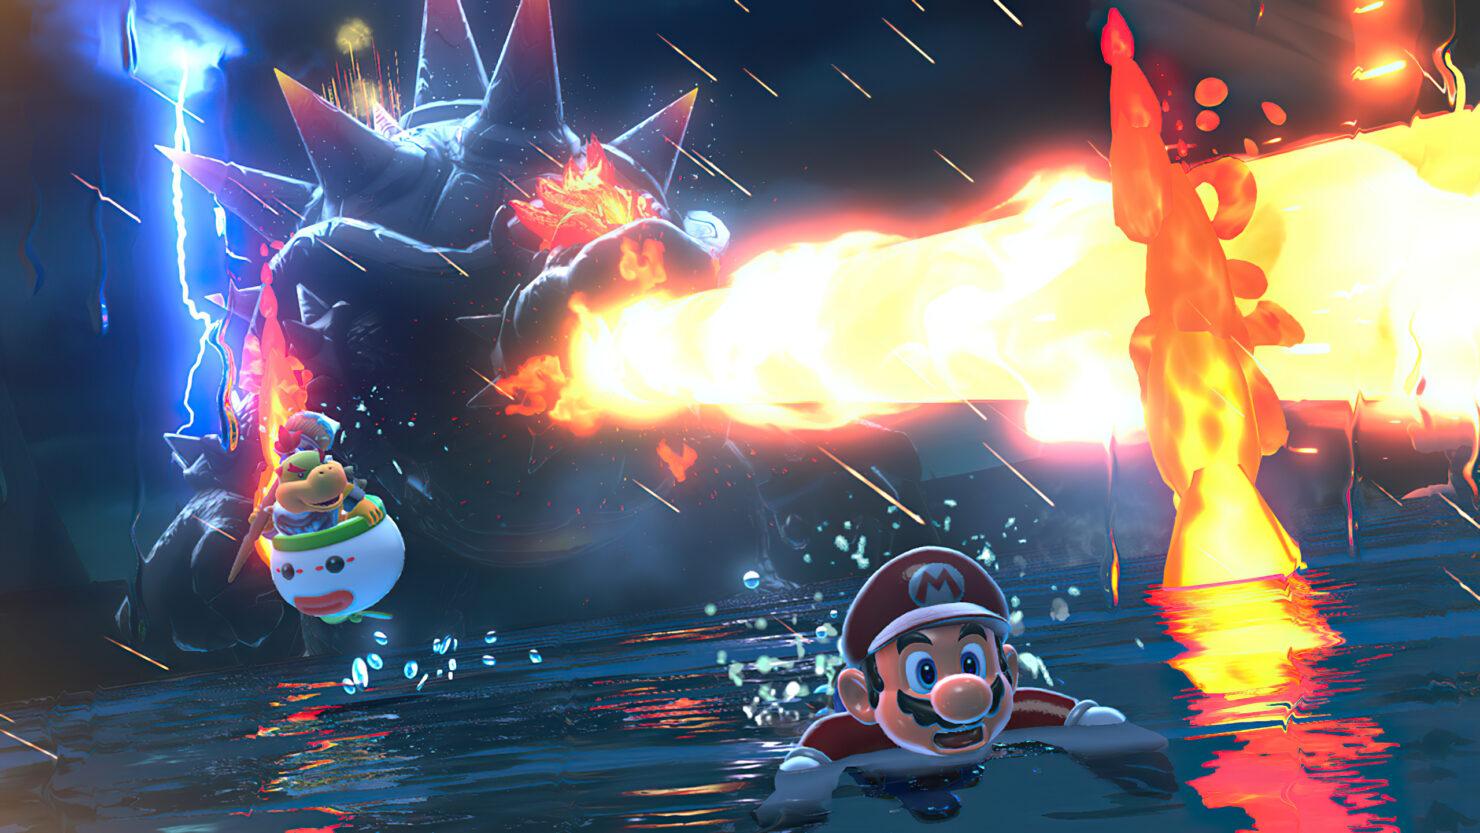 Super Mario 3D World + Bowser's Fury Update 1.1.0